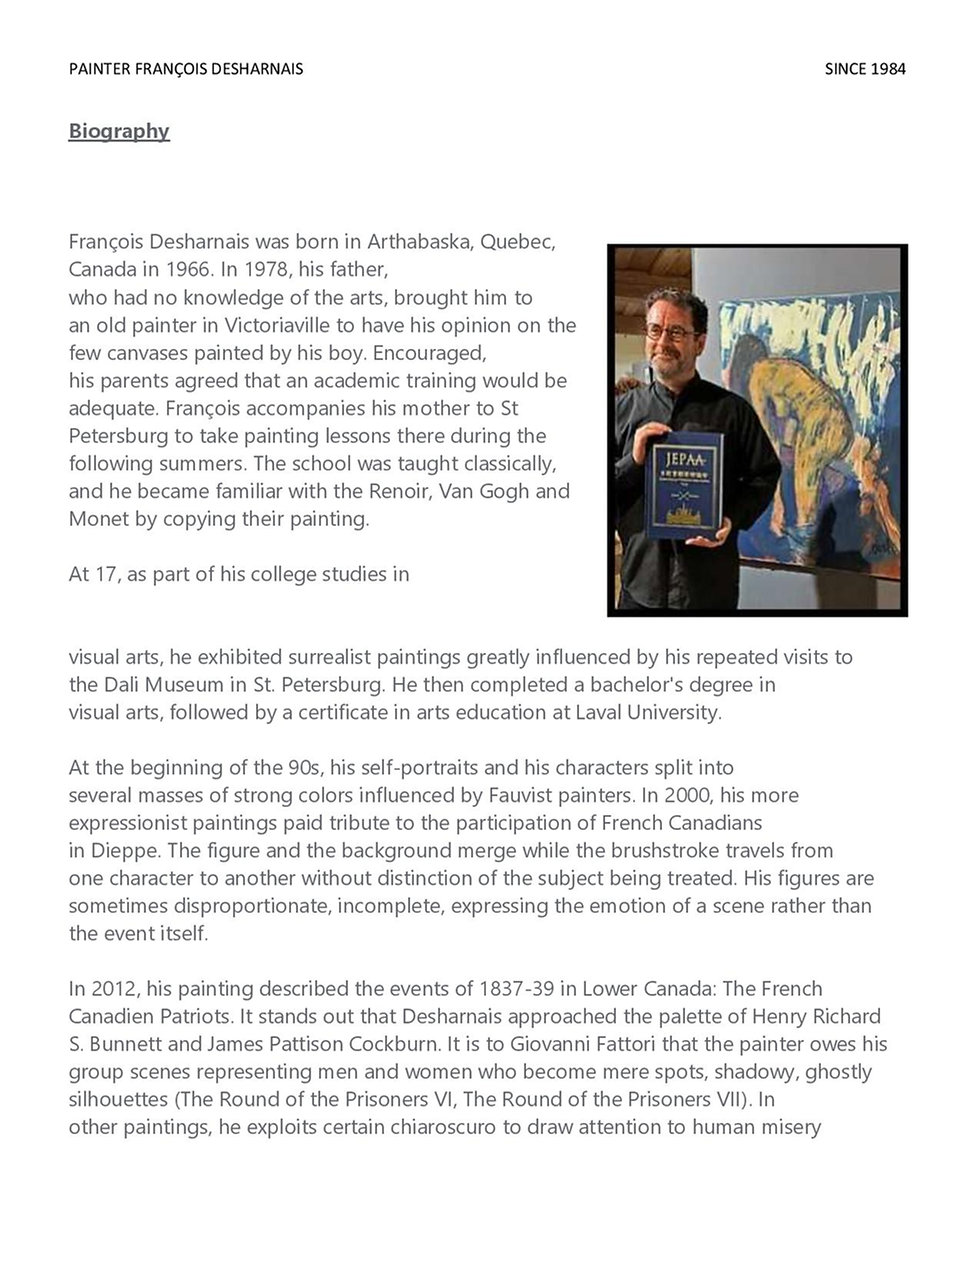 Biography-page-001.jpg